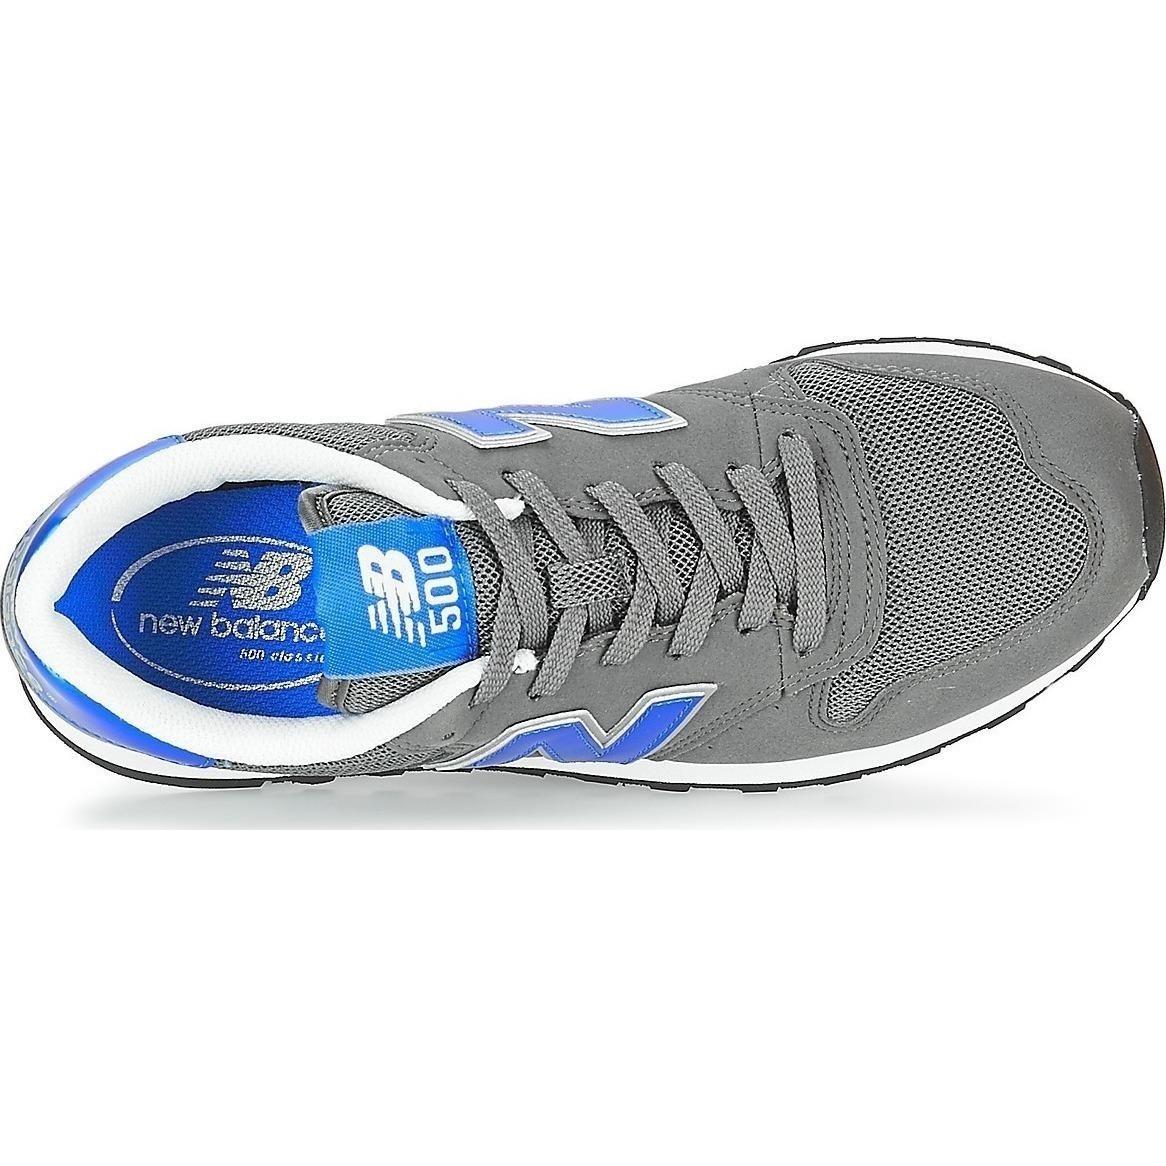 New Balance GM500KSR - Zapatillas para Hombre, Gris/Azul, 40 (6.5 UK)